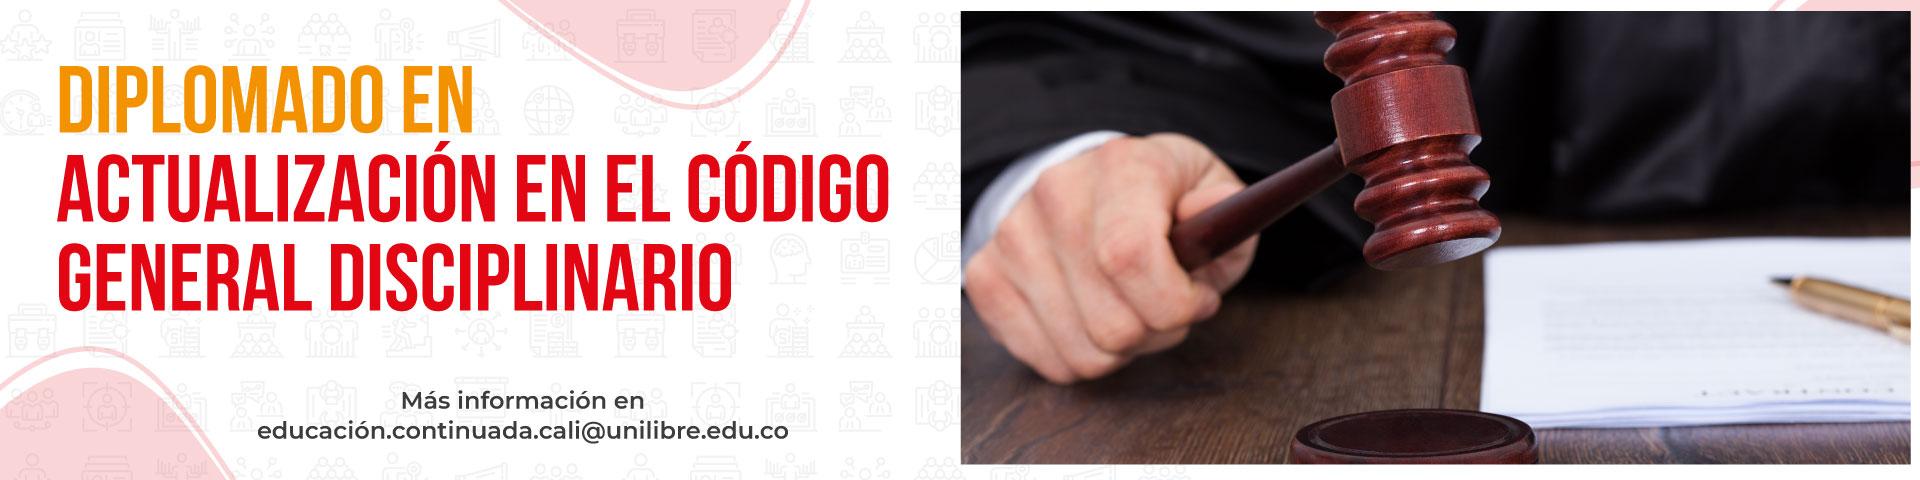 bannerweb_diplomado_derecho